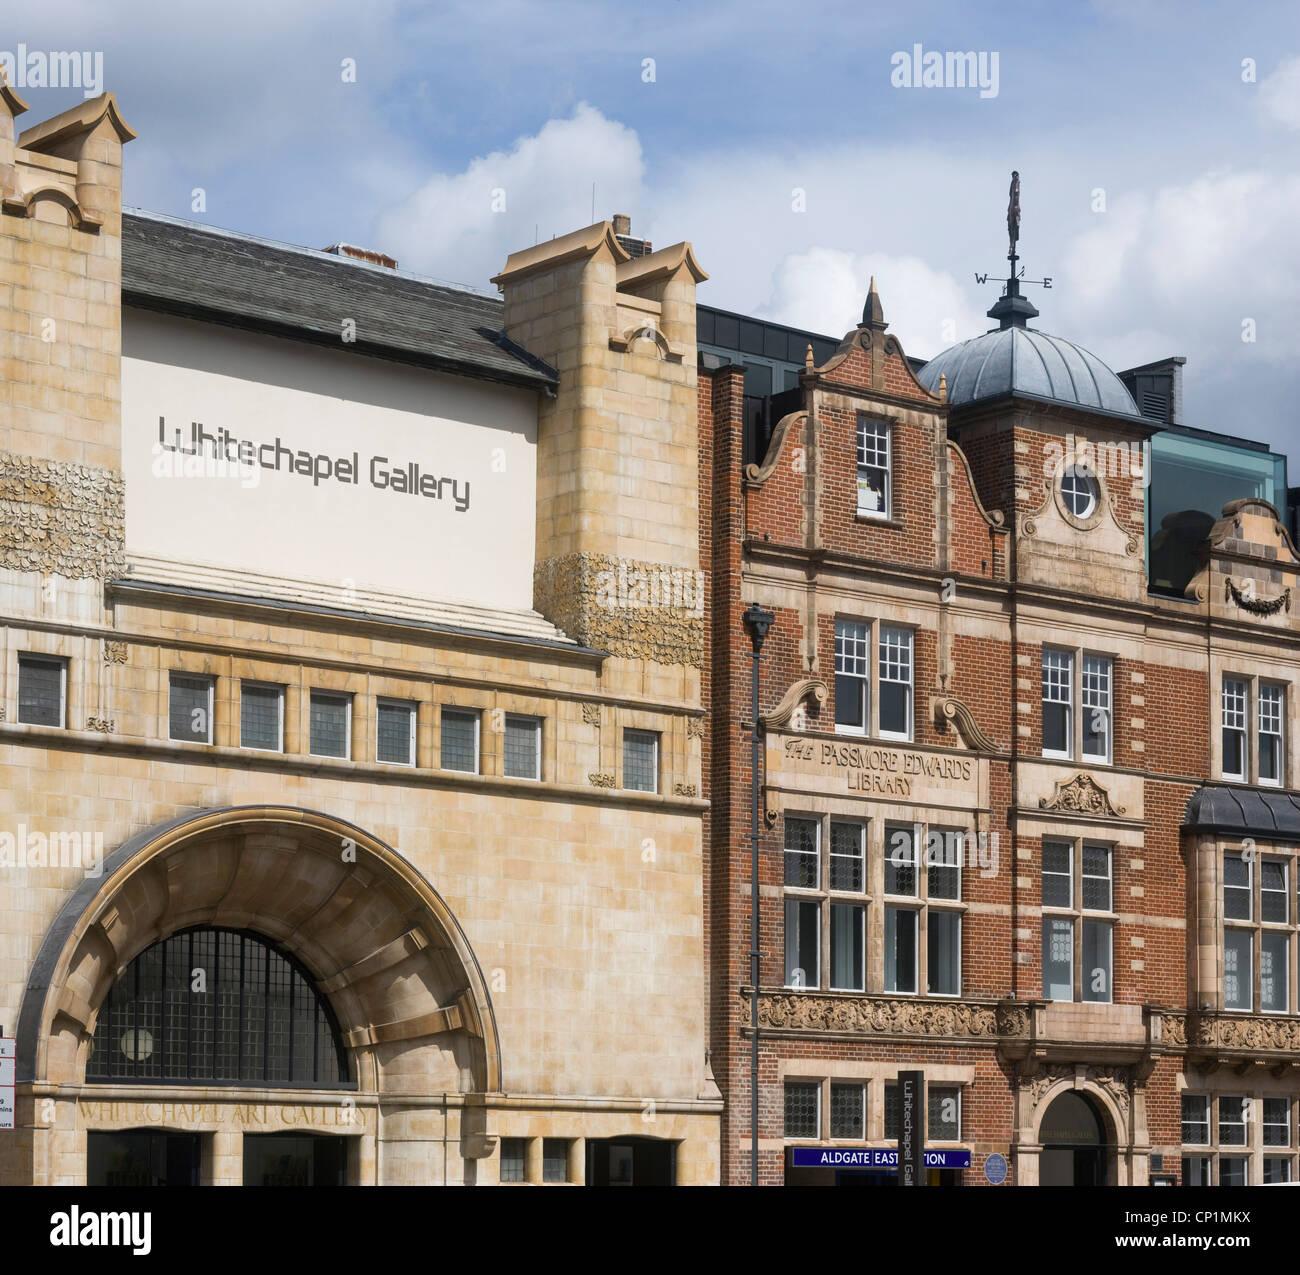 Whitechapel Art Gallery, London, England. Stock Photo